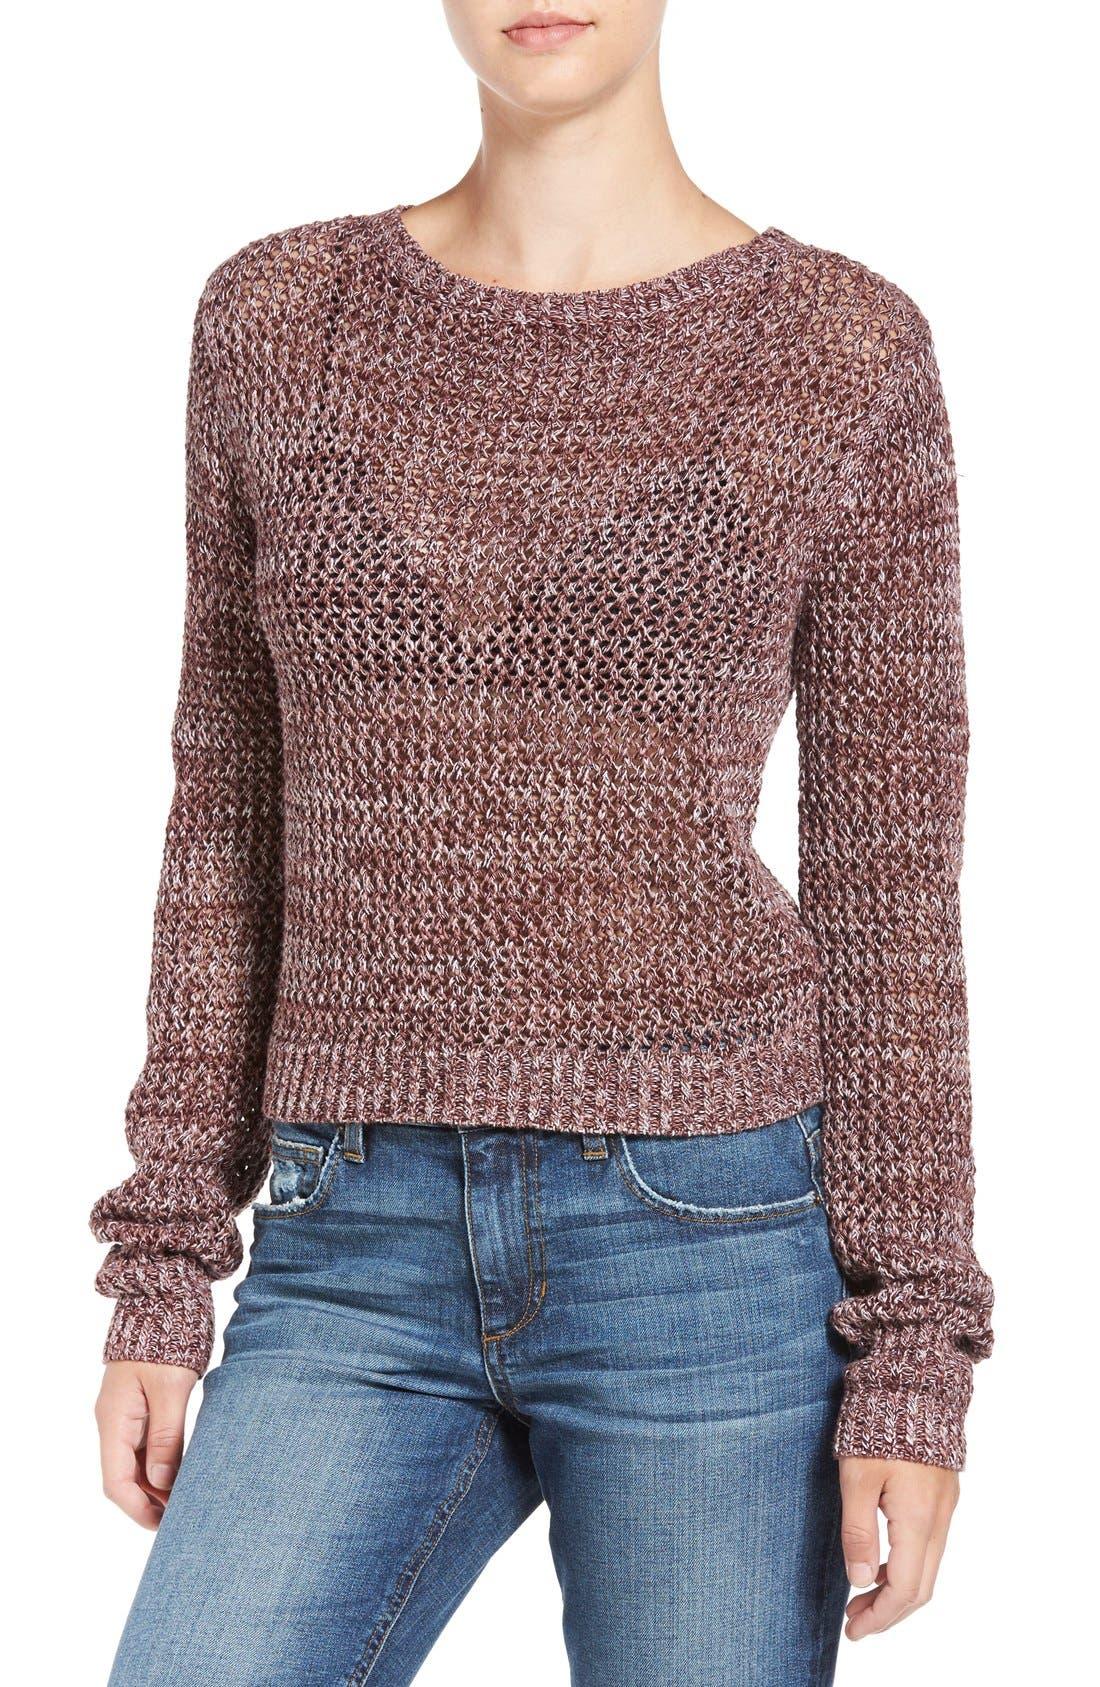 Alternate Image 1 Selected - Joe's 'Reed' Crochet Cotton Sweater